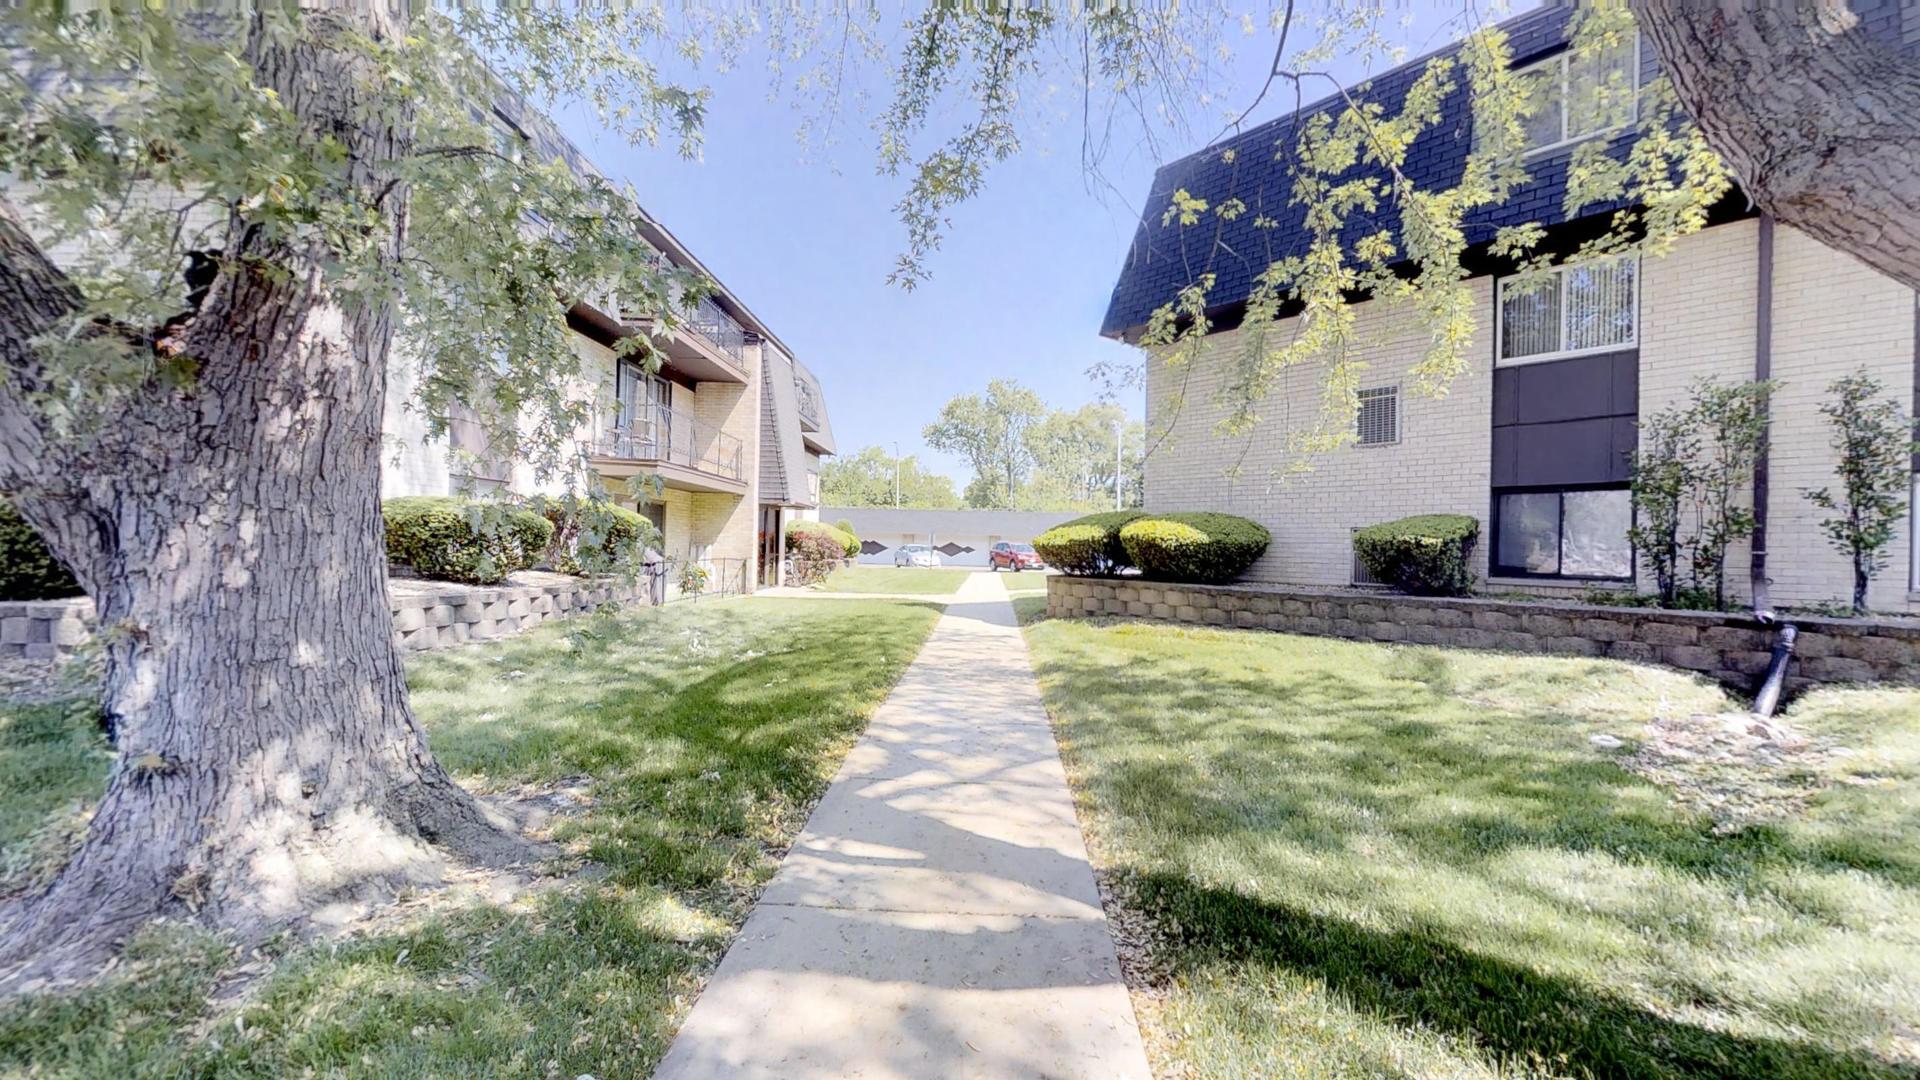 11109 South 84th 3B, Palos Hills, Illinois, 60465